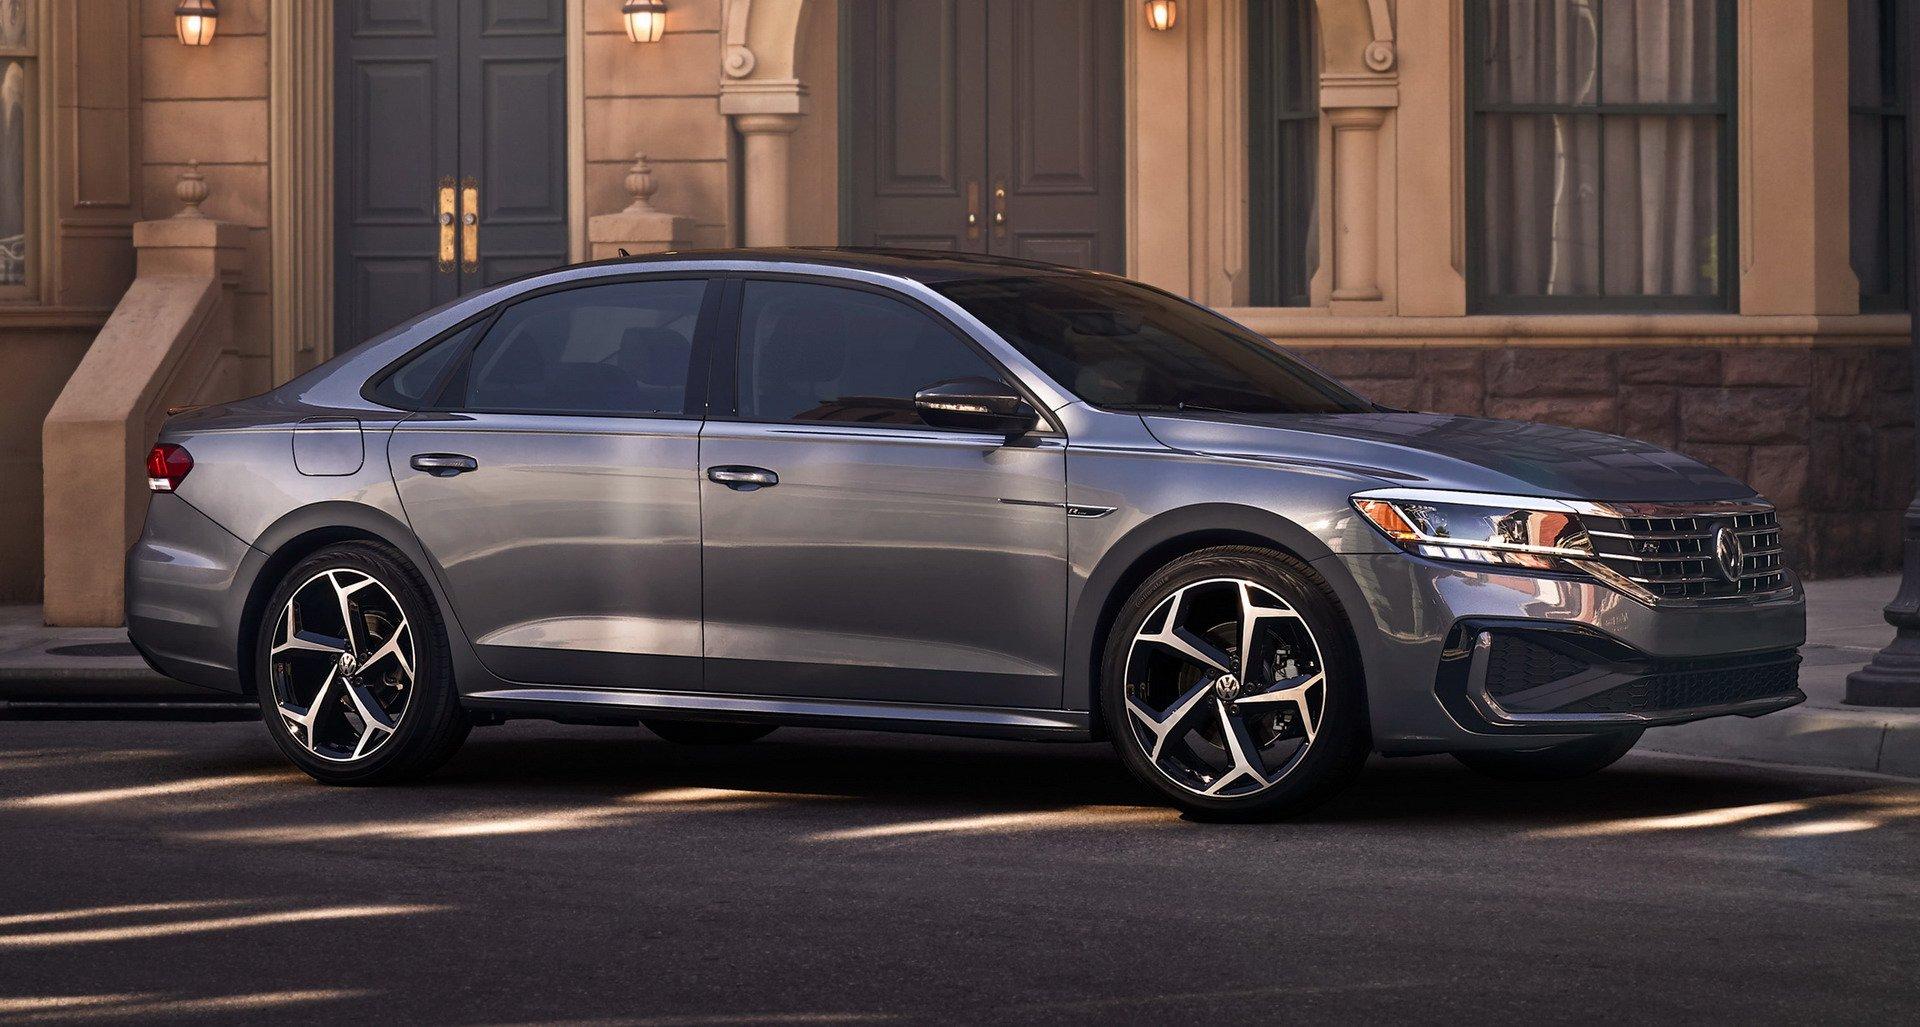 Salão de Detroit: Volkswagen remodela Passat norte americano